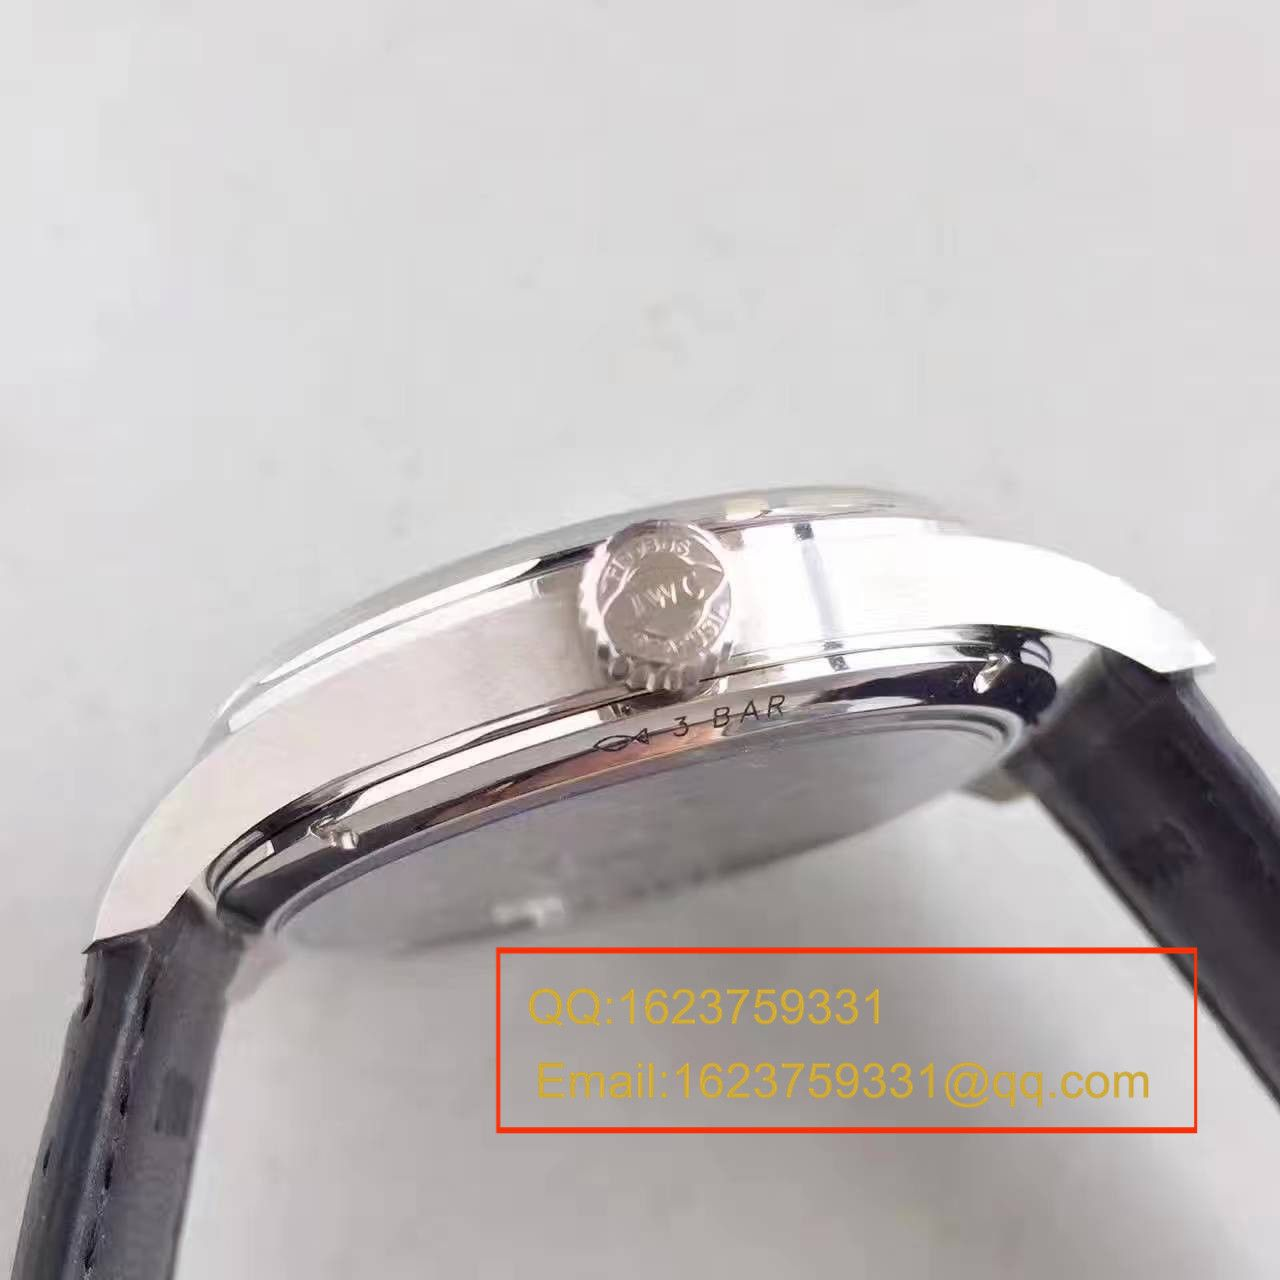 【YL厂1:1复刻手表】万国葡萄牙系列琼斯之剑IW544403腕表 / WG073